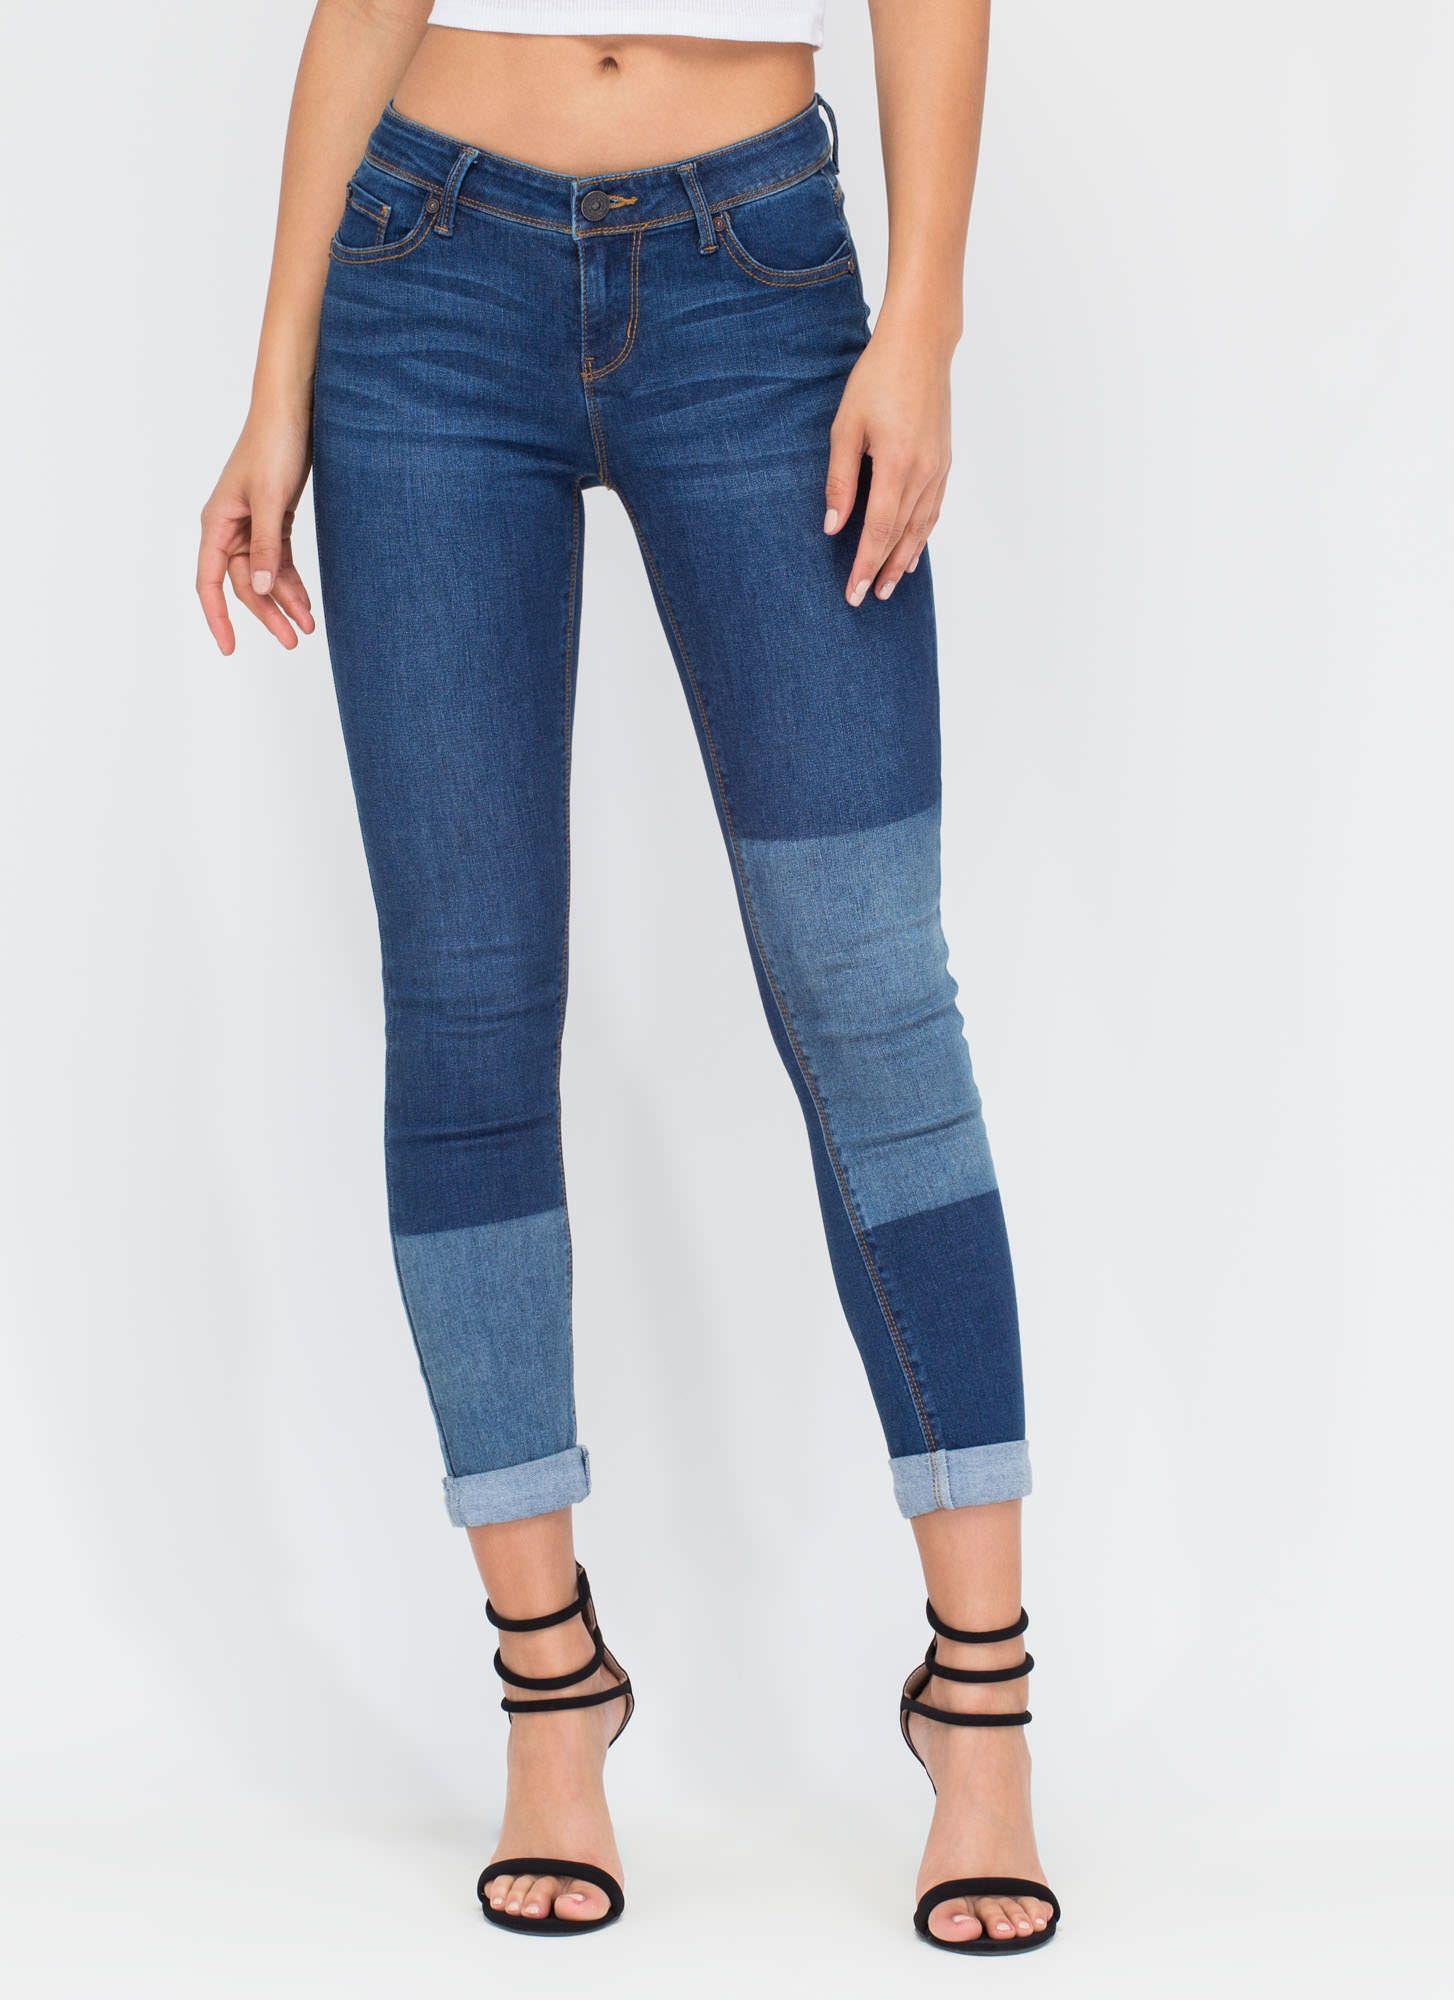 599c0b818847 Effortless Faded Patch Skinny Jeans BLUE - GoJane.com | DIY Fashions ...